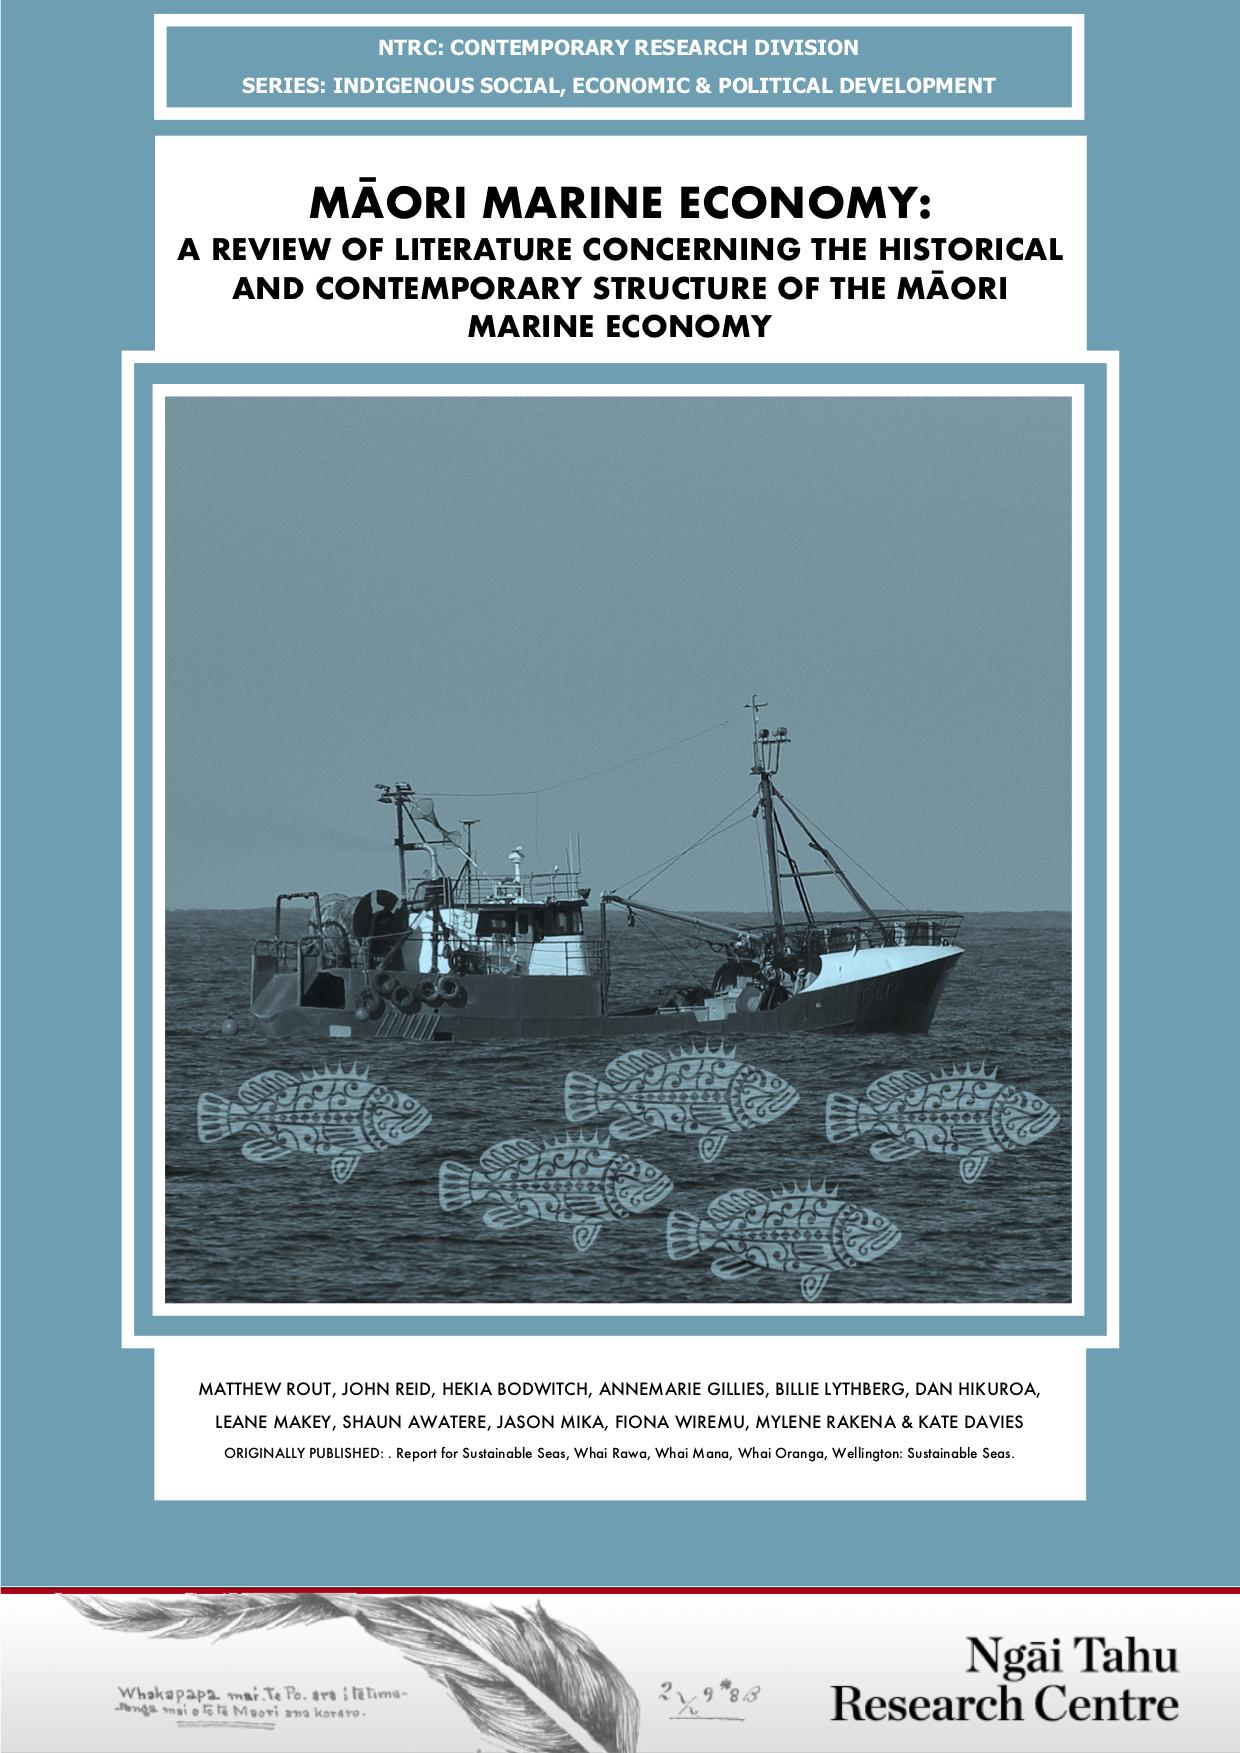 Image - Māori marine economy - Lit Review